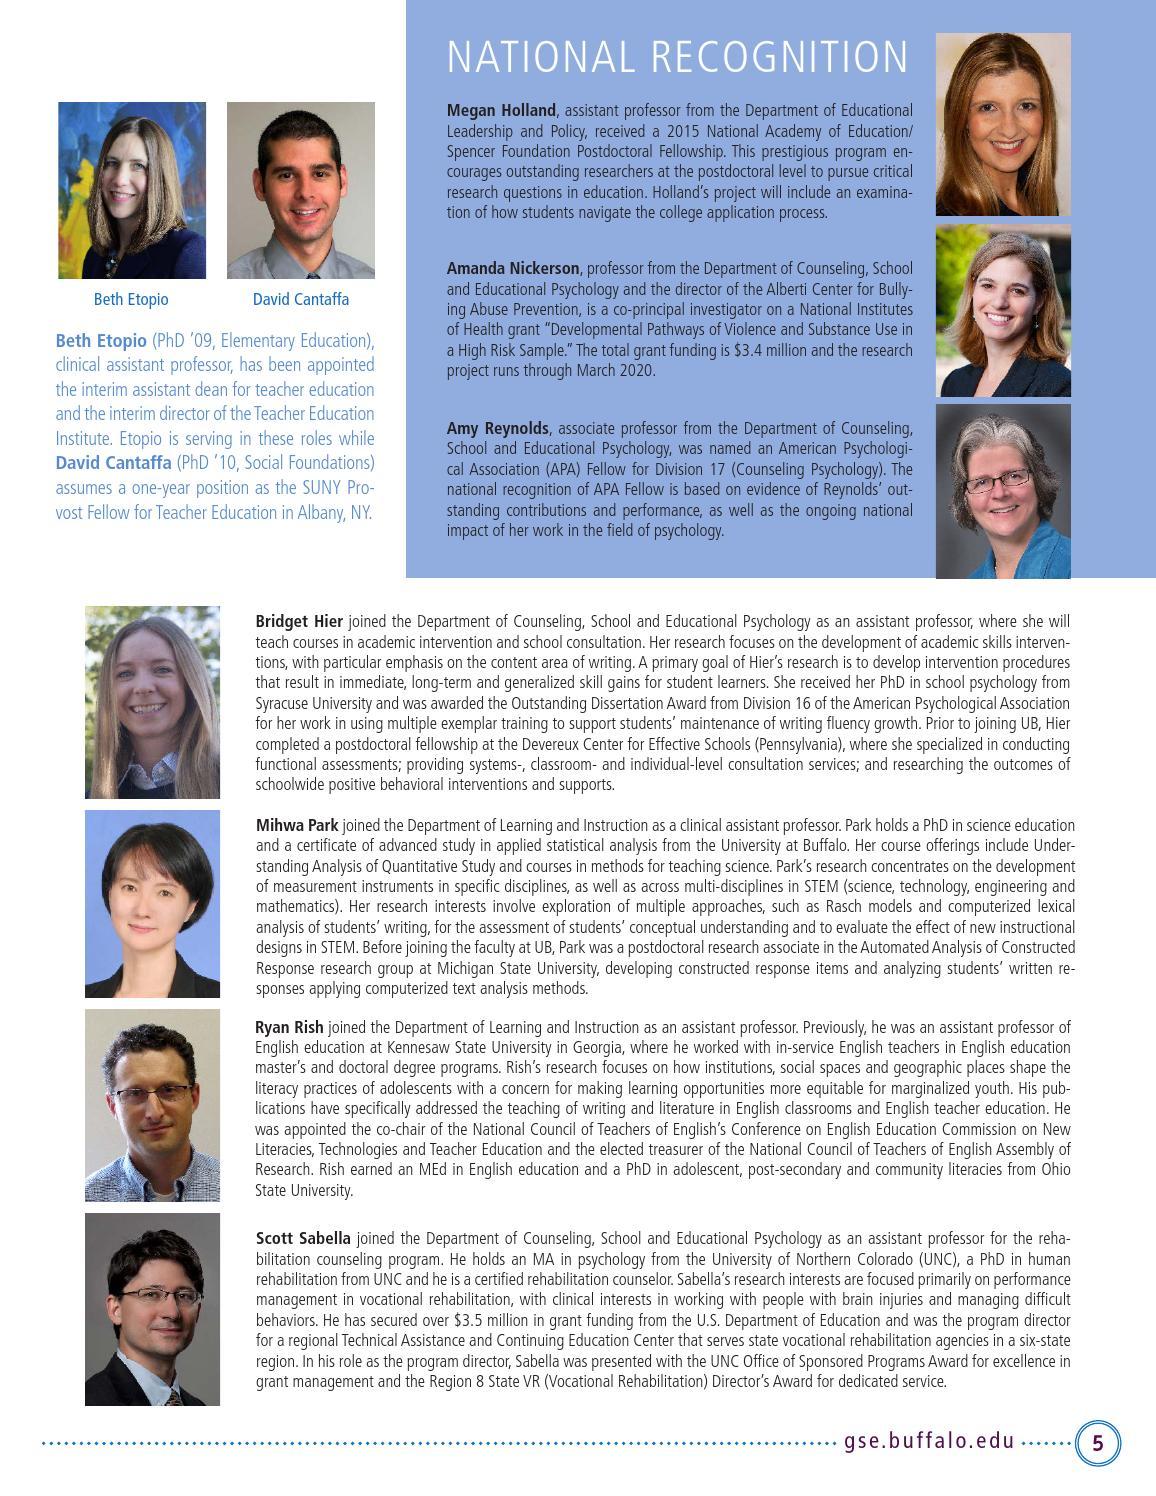 GSE  edu Alumni Newsletter - Fall 2015/Spring 2016 by UB GSE